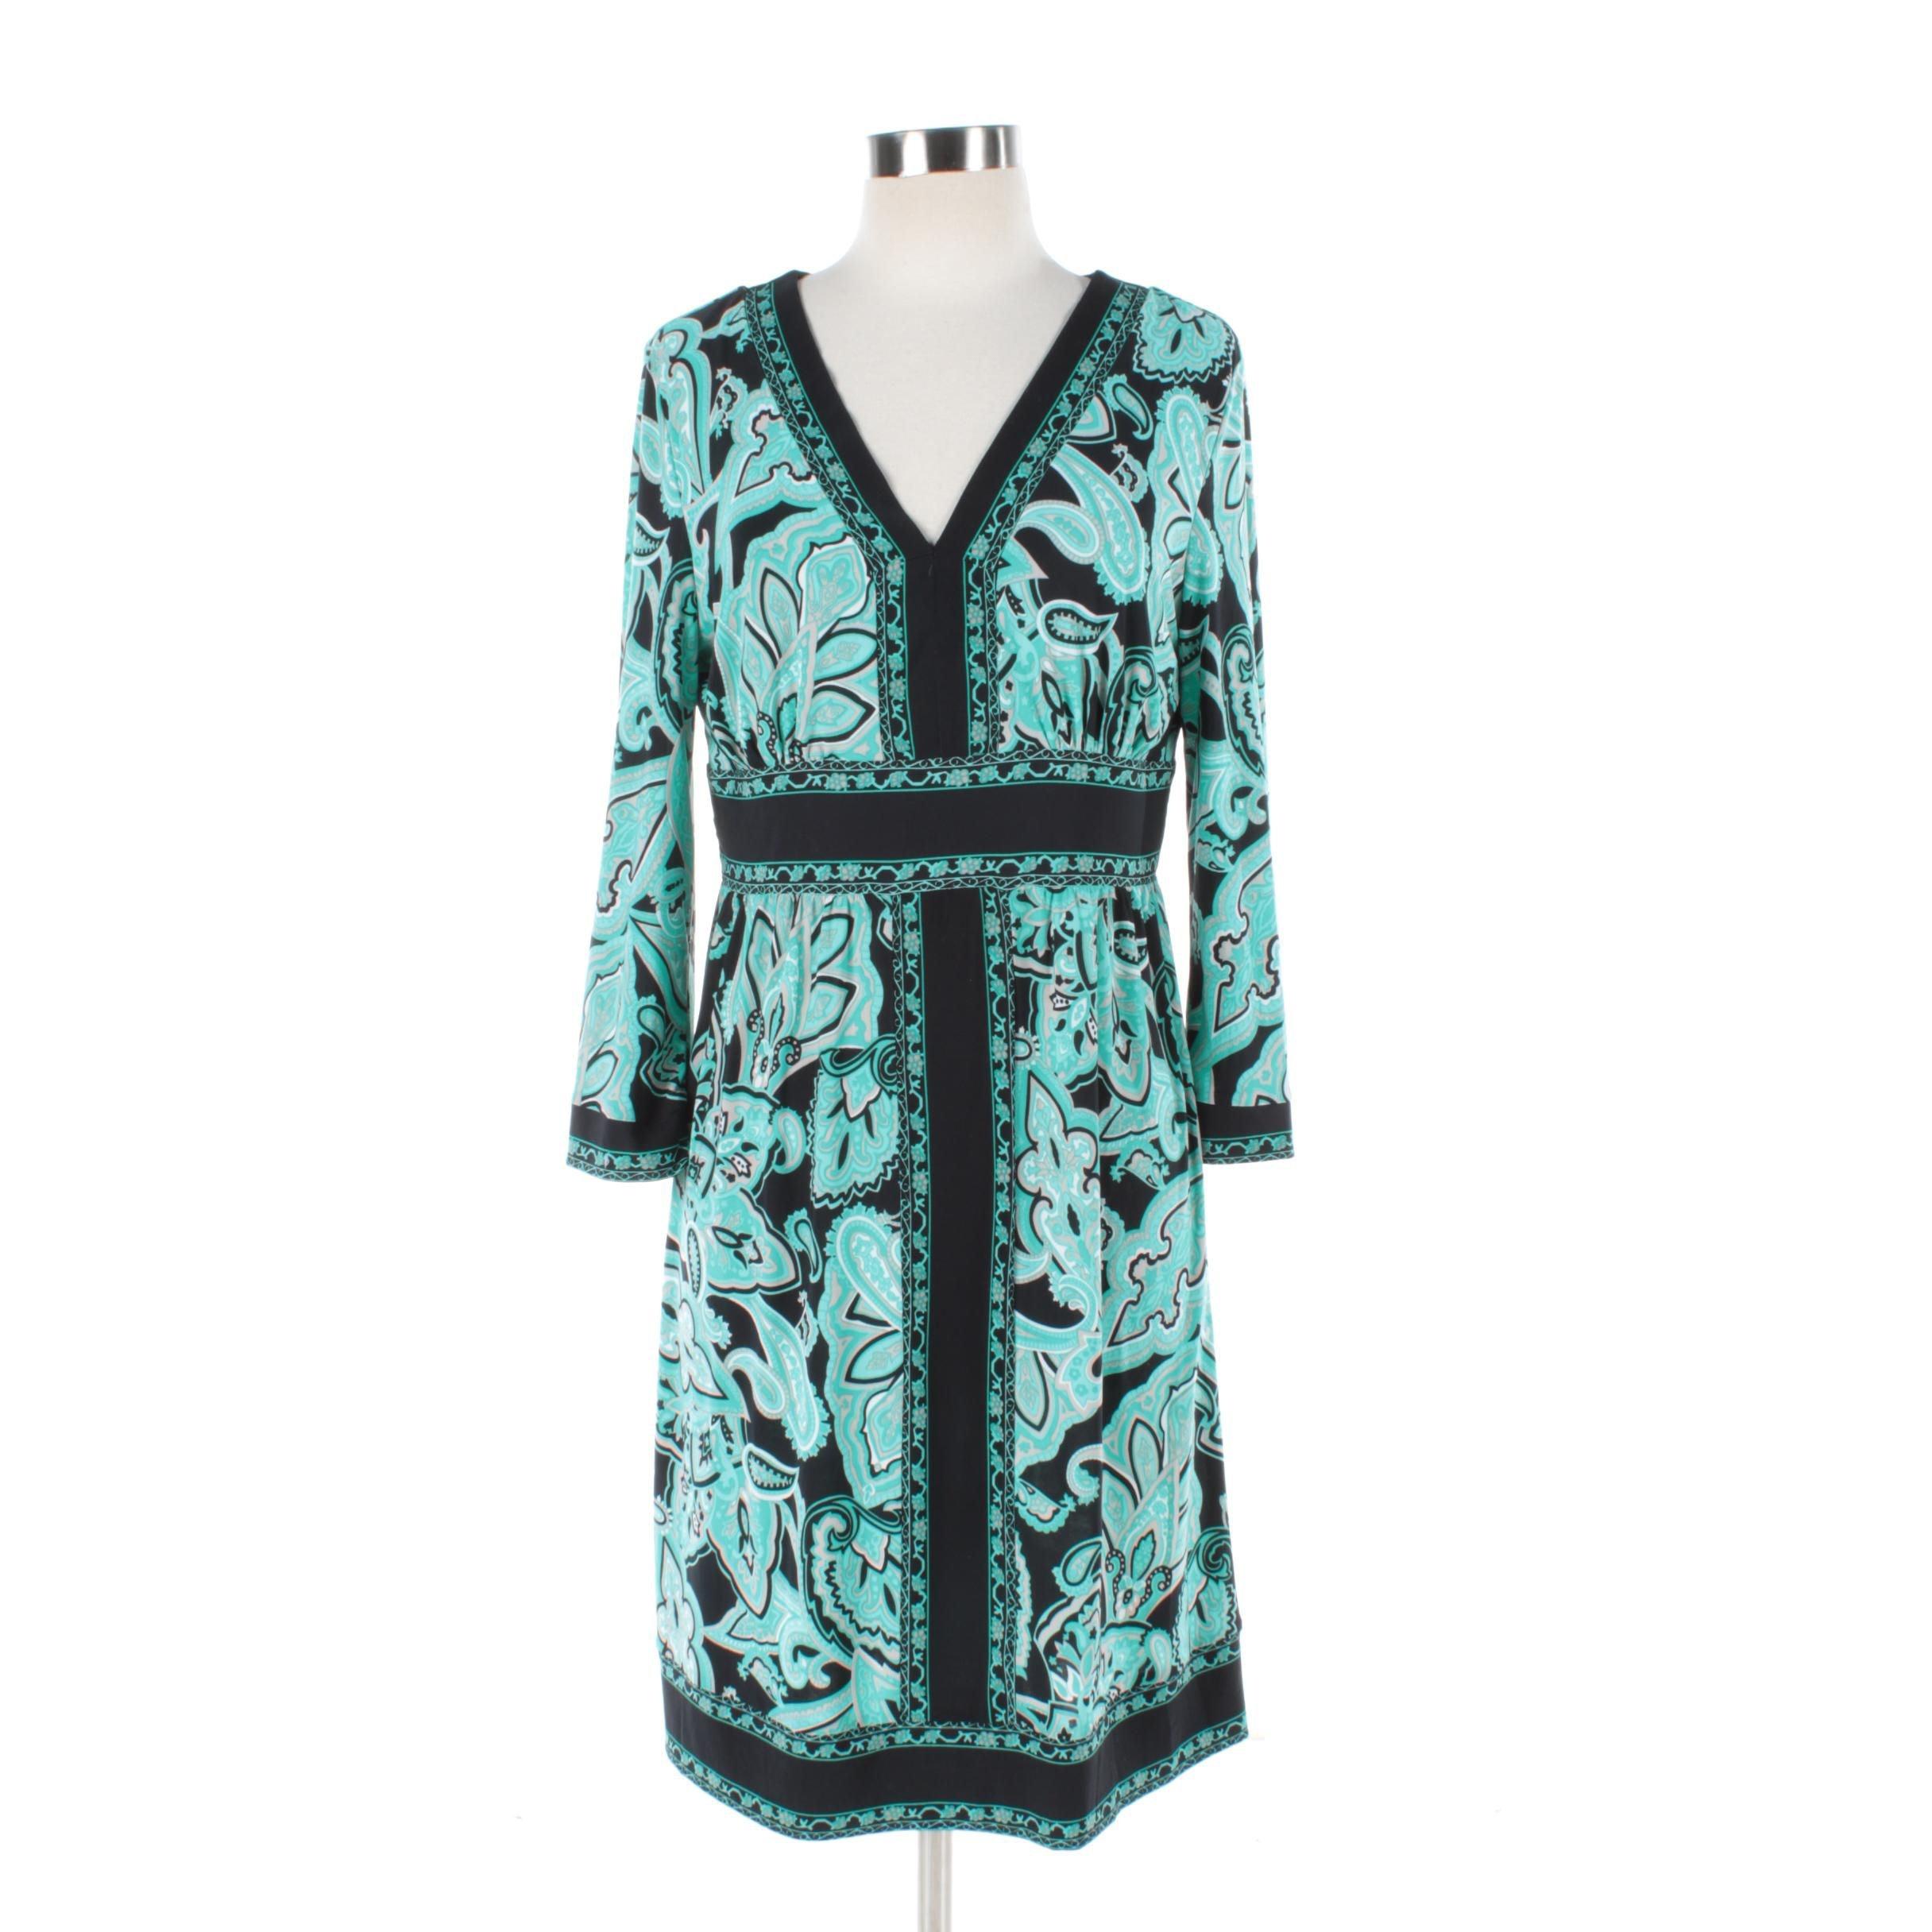 INC Black and Teal Paisley Print Dress